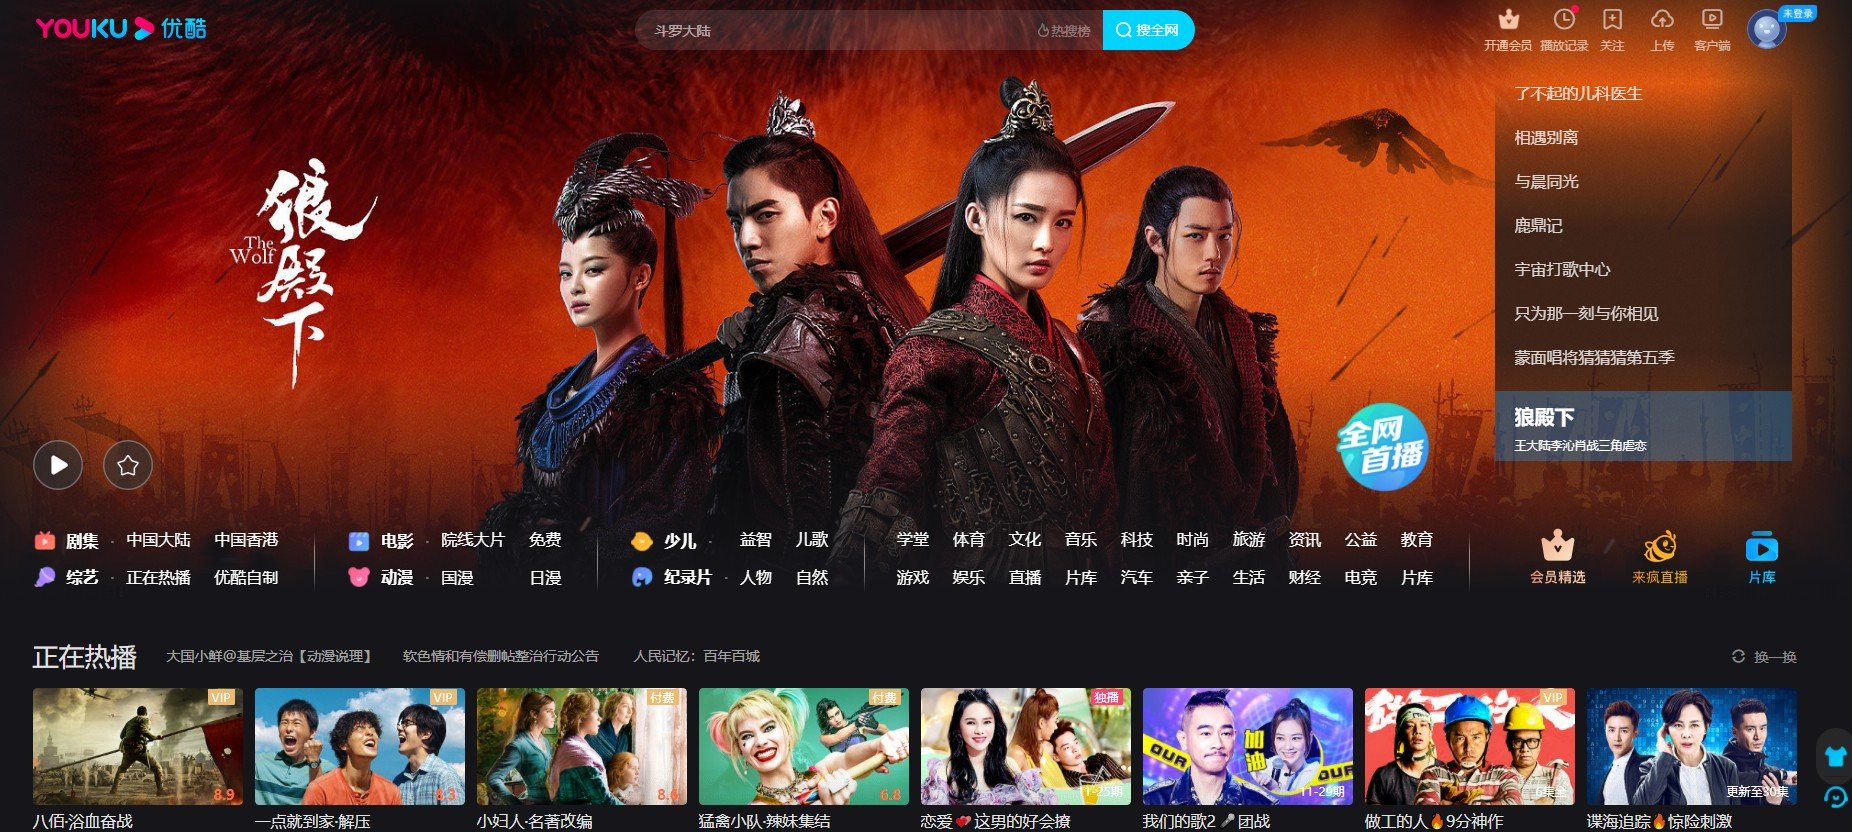 Alibaba owns Youku Long video platform